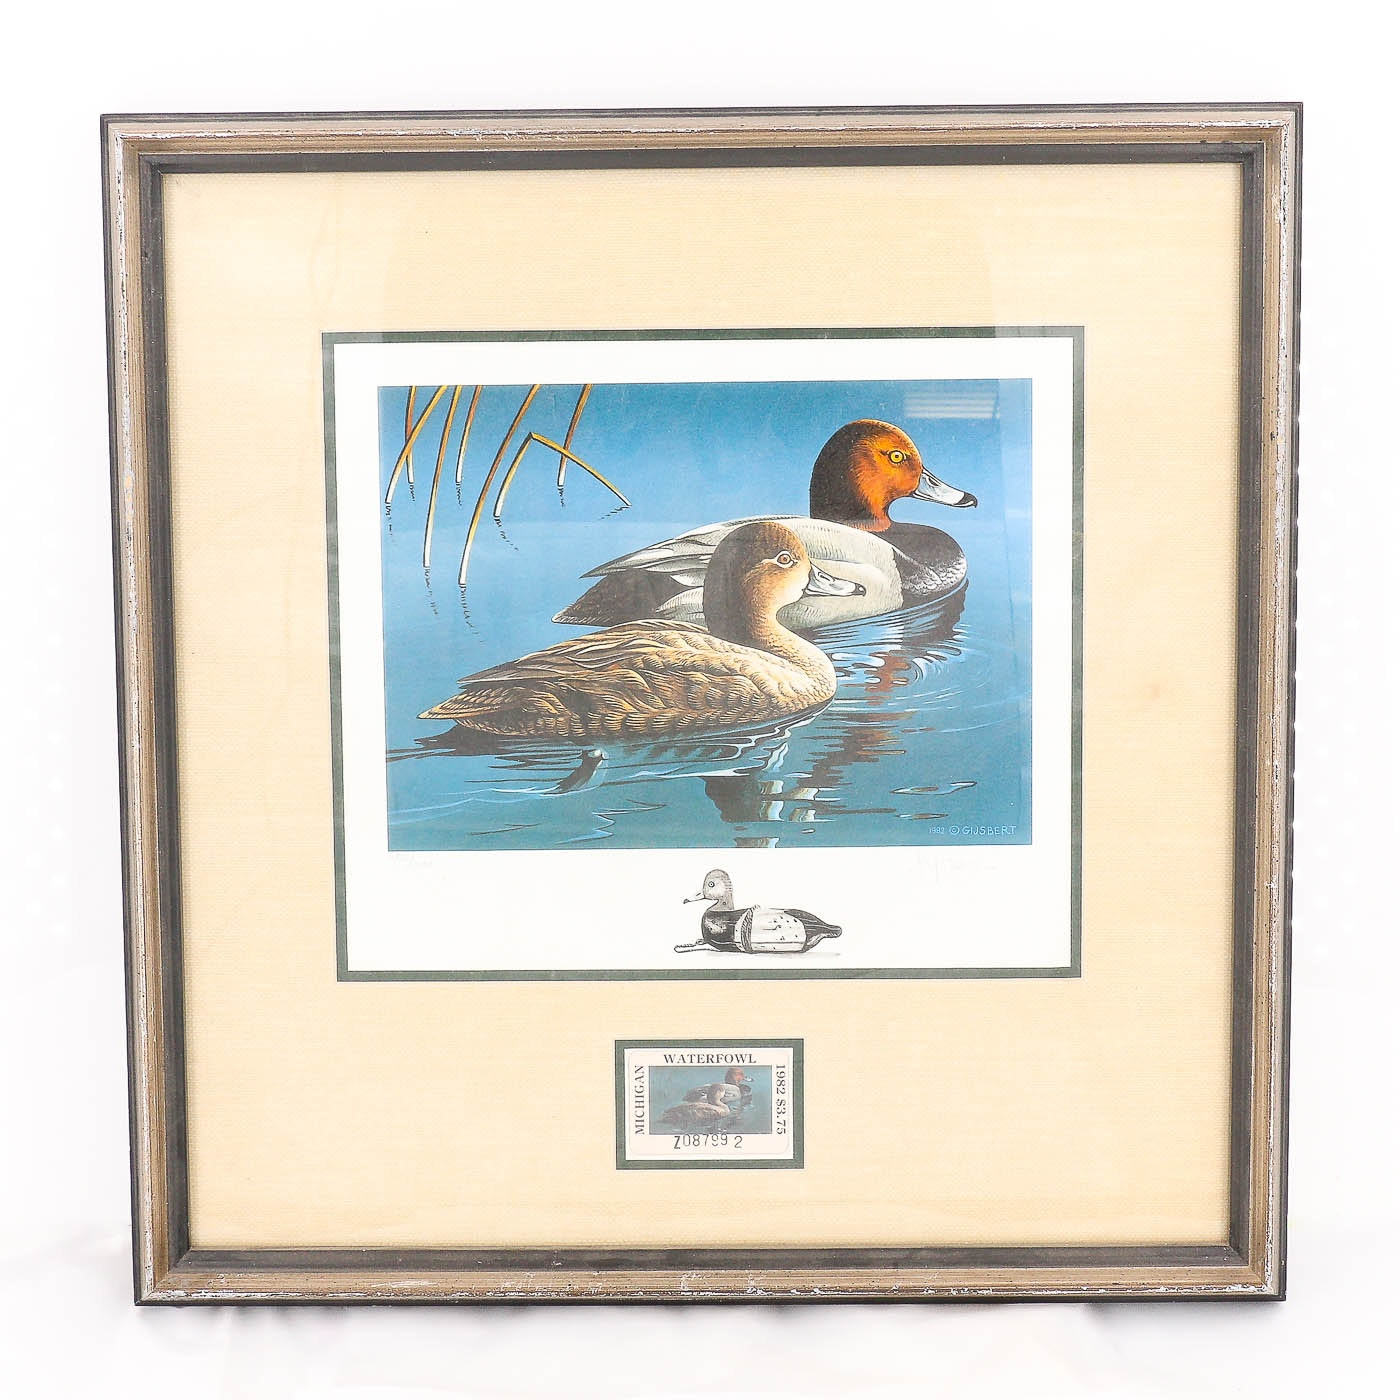 Gijsbert van Frankenhuyzen Michigan Duck Stamp Offset Lithograph and Stamp